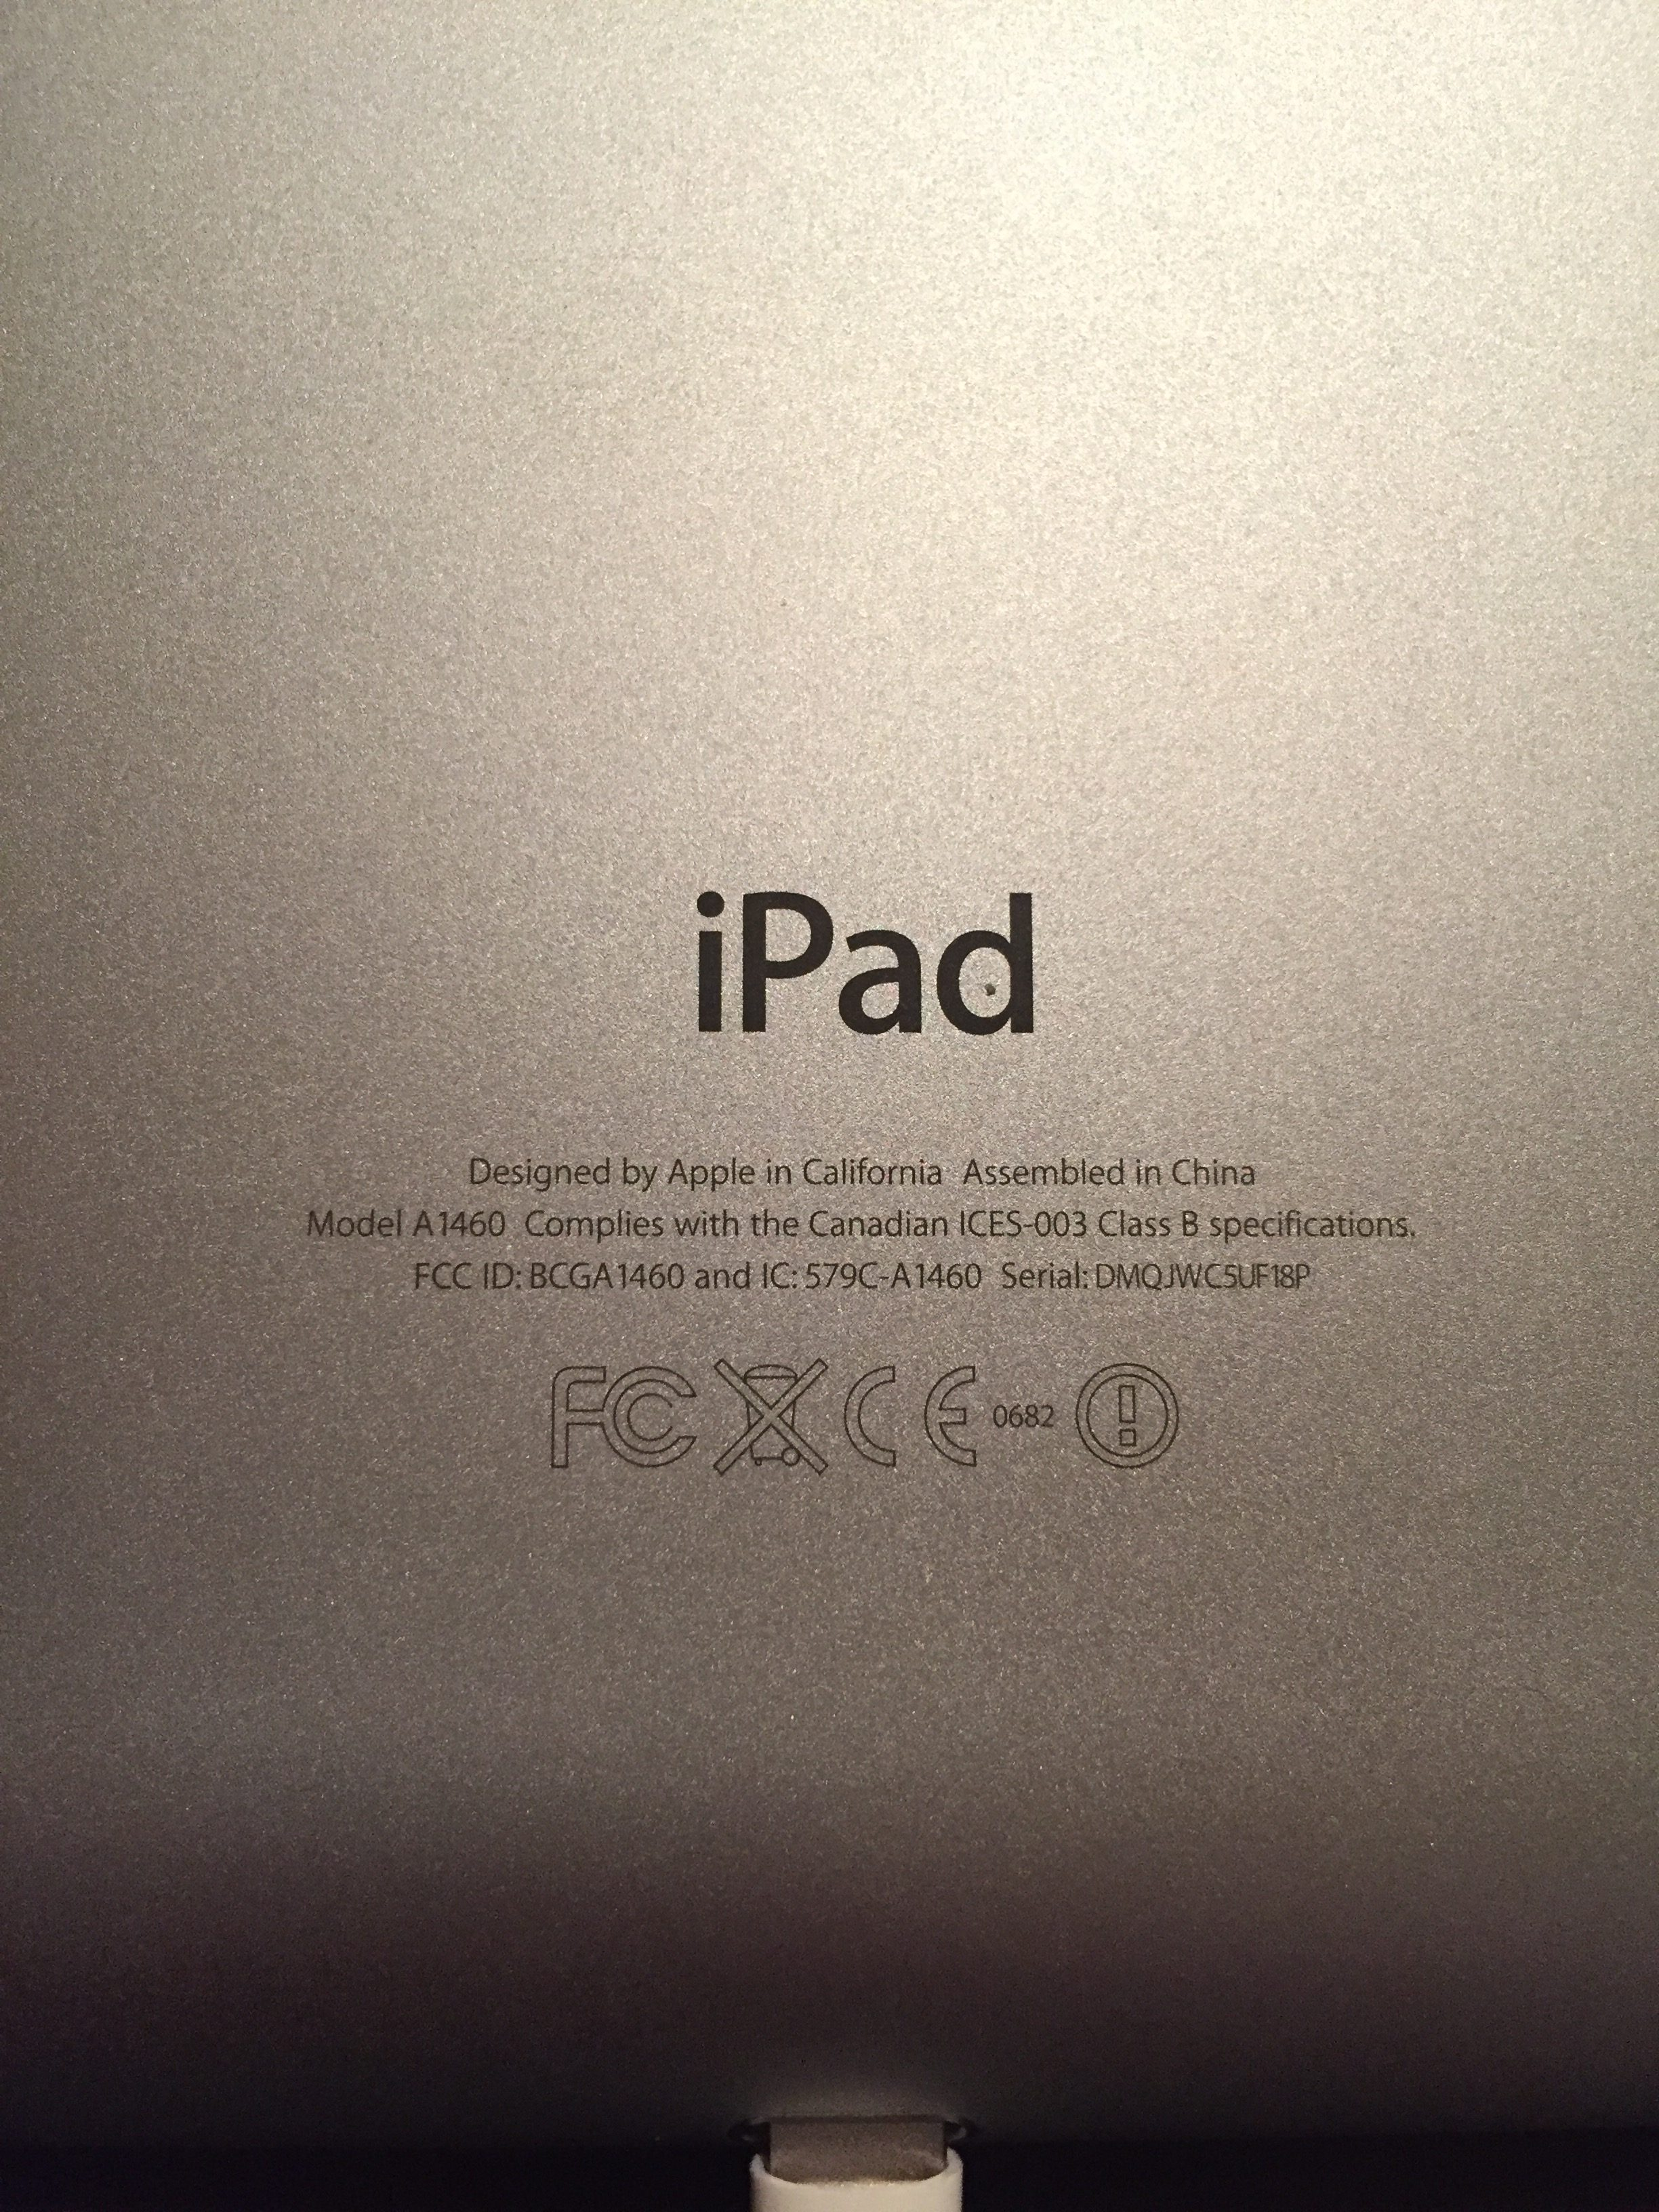 IPad - Apple (FI) IPad Pro - Apple (FI)